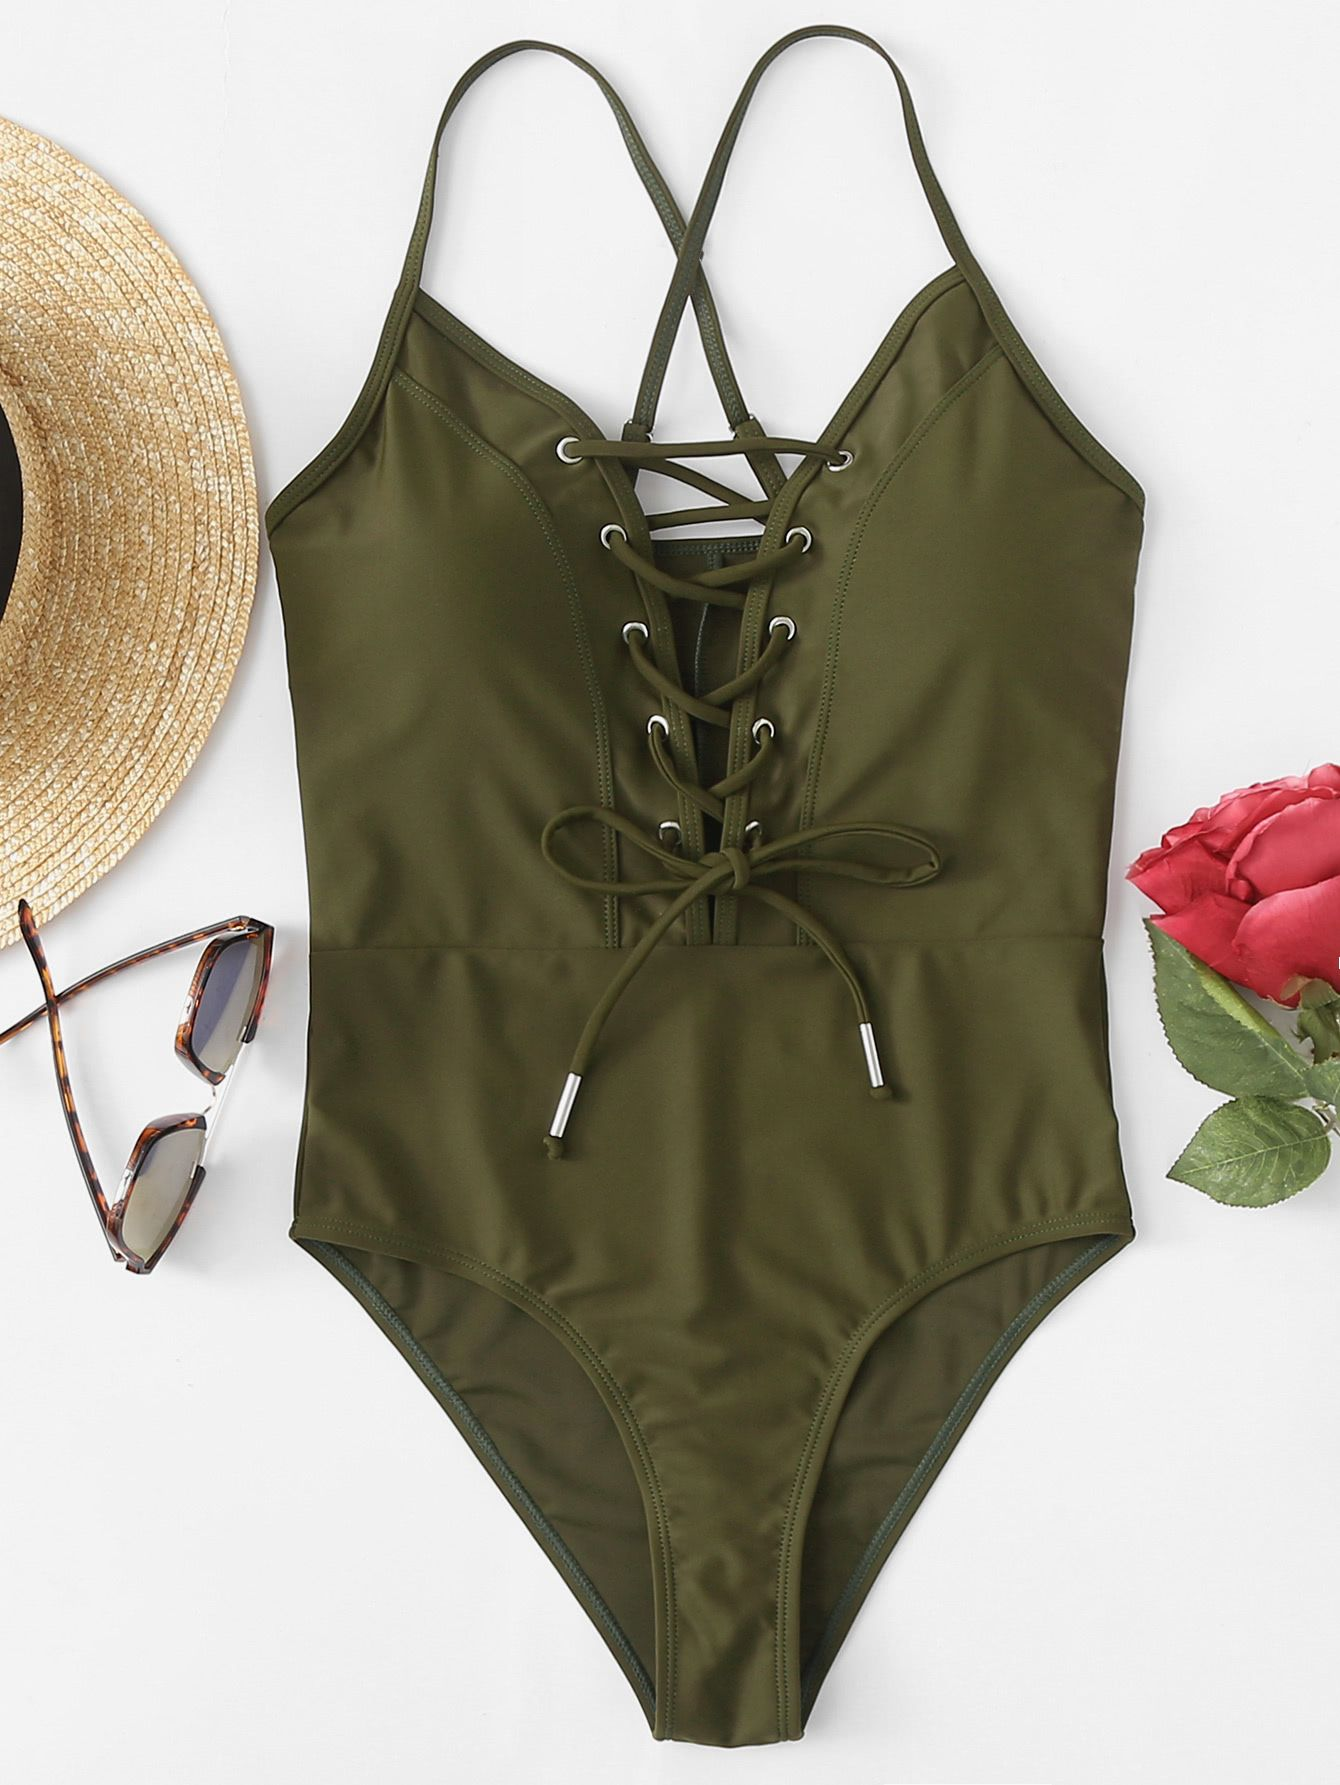 434f0a75a5 Crisscross Back Lace Up Front Swimsuit #swimsuits,#bikini,#swimsuit,#romwe,# bathing-suits,#monokini,#cute-swimsuits,#bikini-online,#swimwear,bikini  swimwear ...